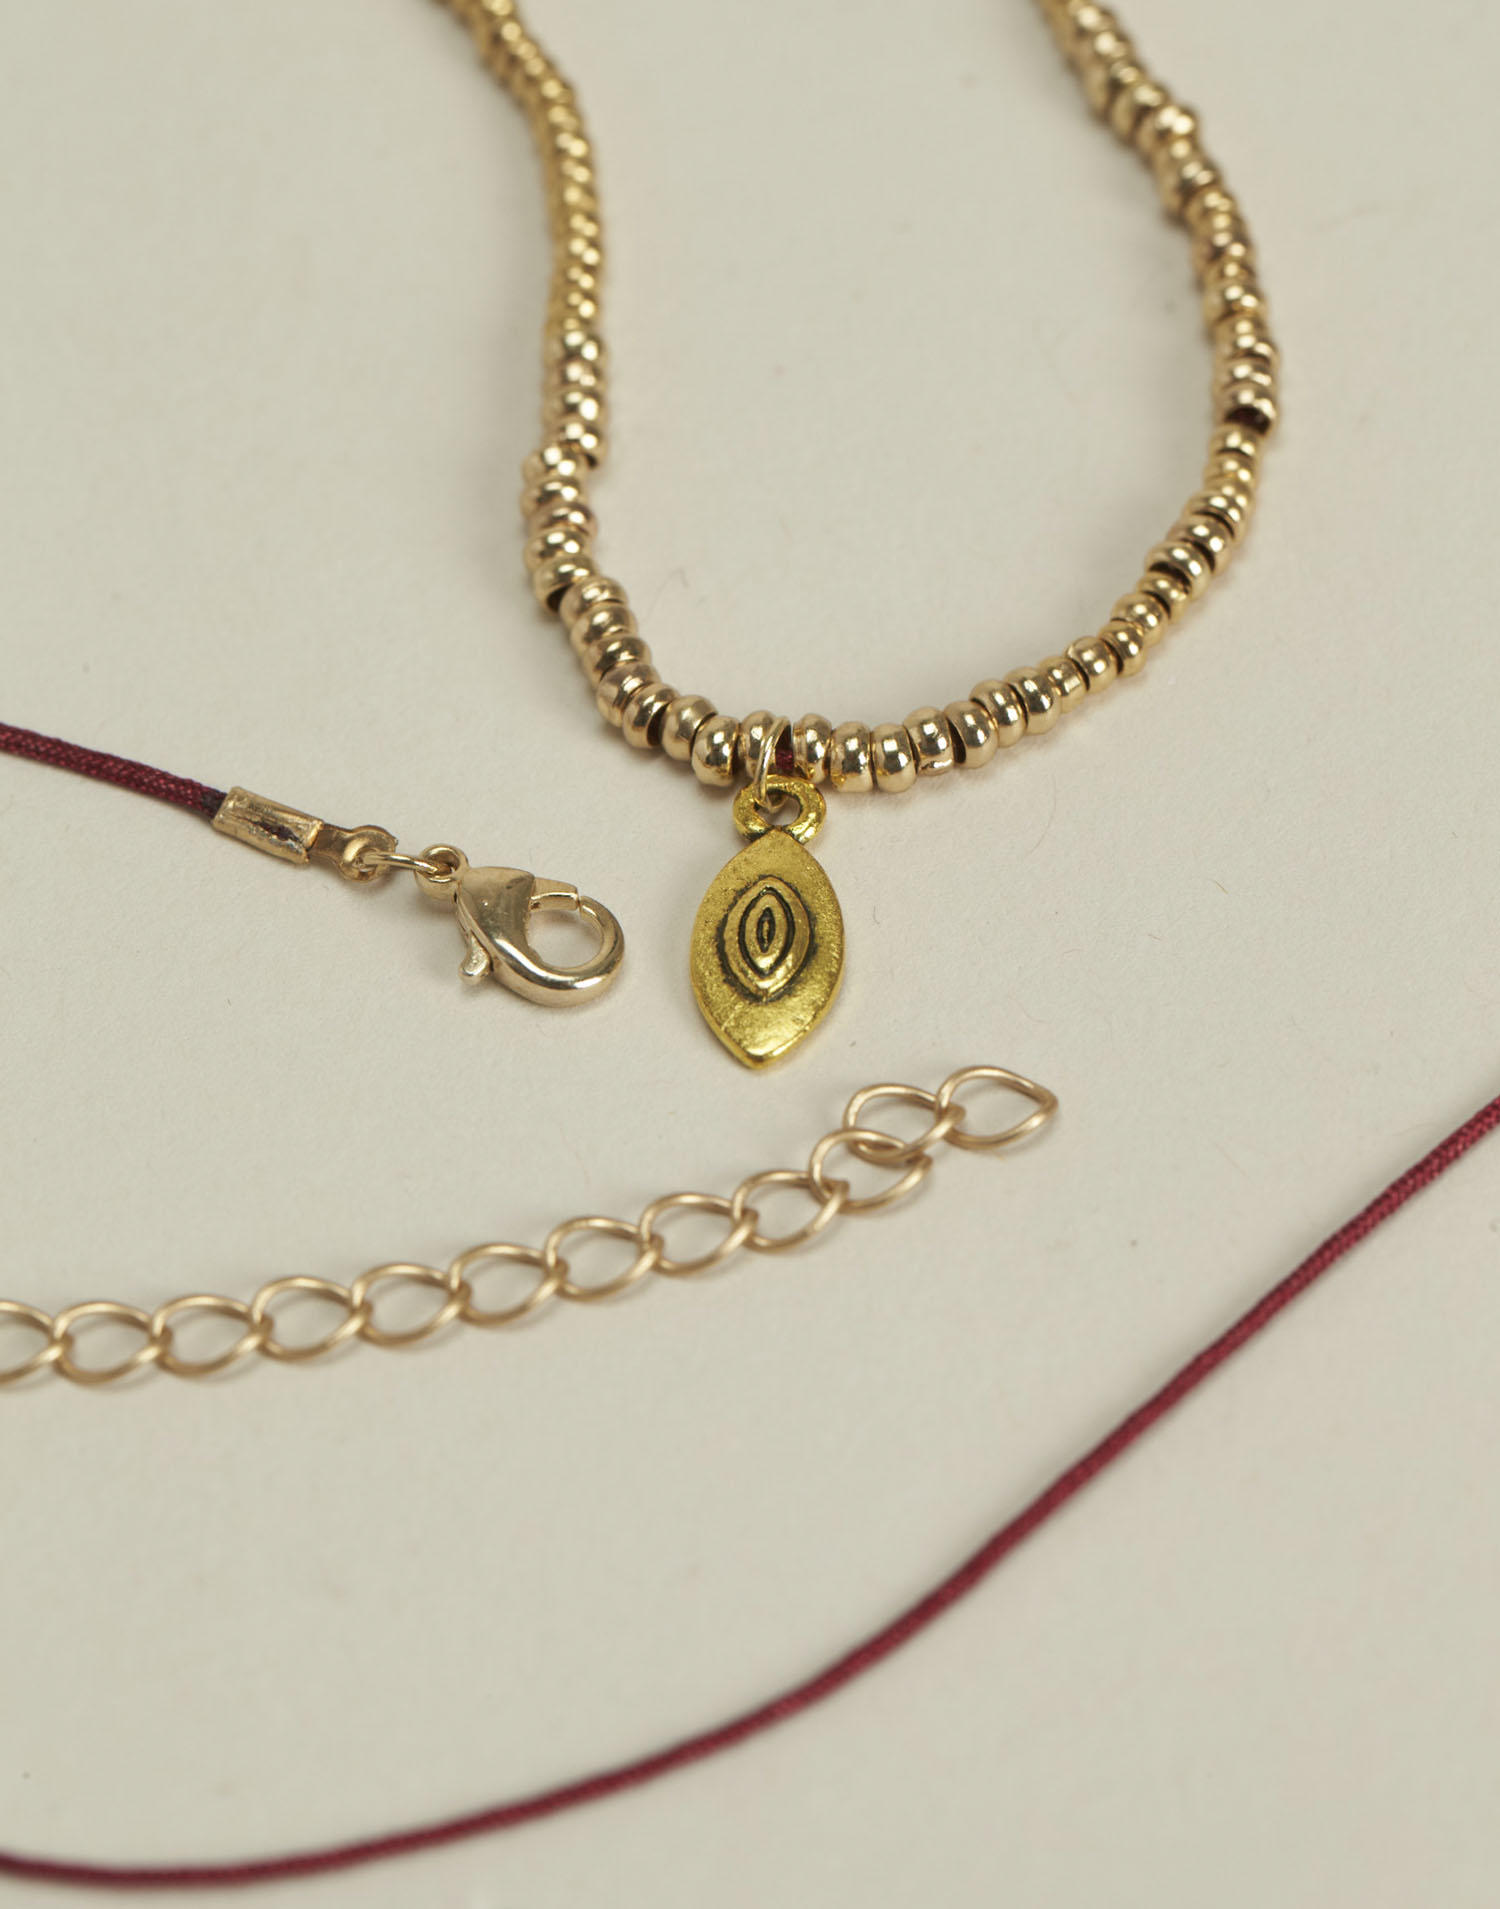 Thread and tear necklace